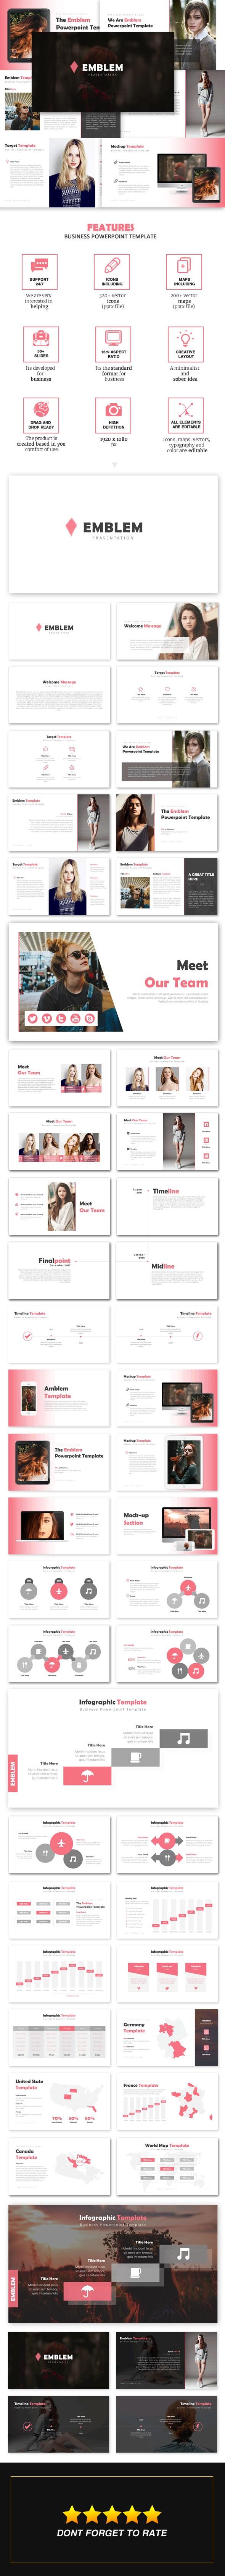 Emblem - Business Powerpoint Template - Business PowerPoint Templates